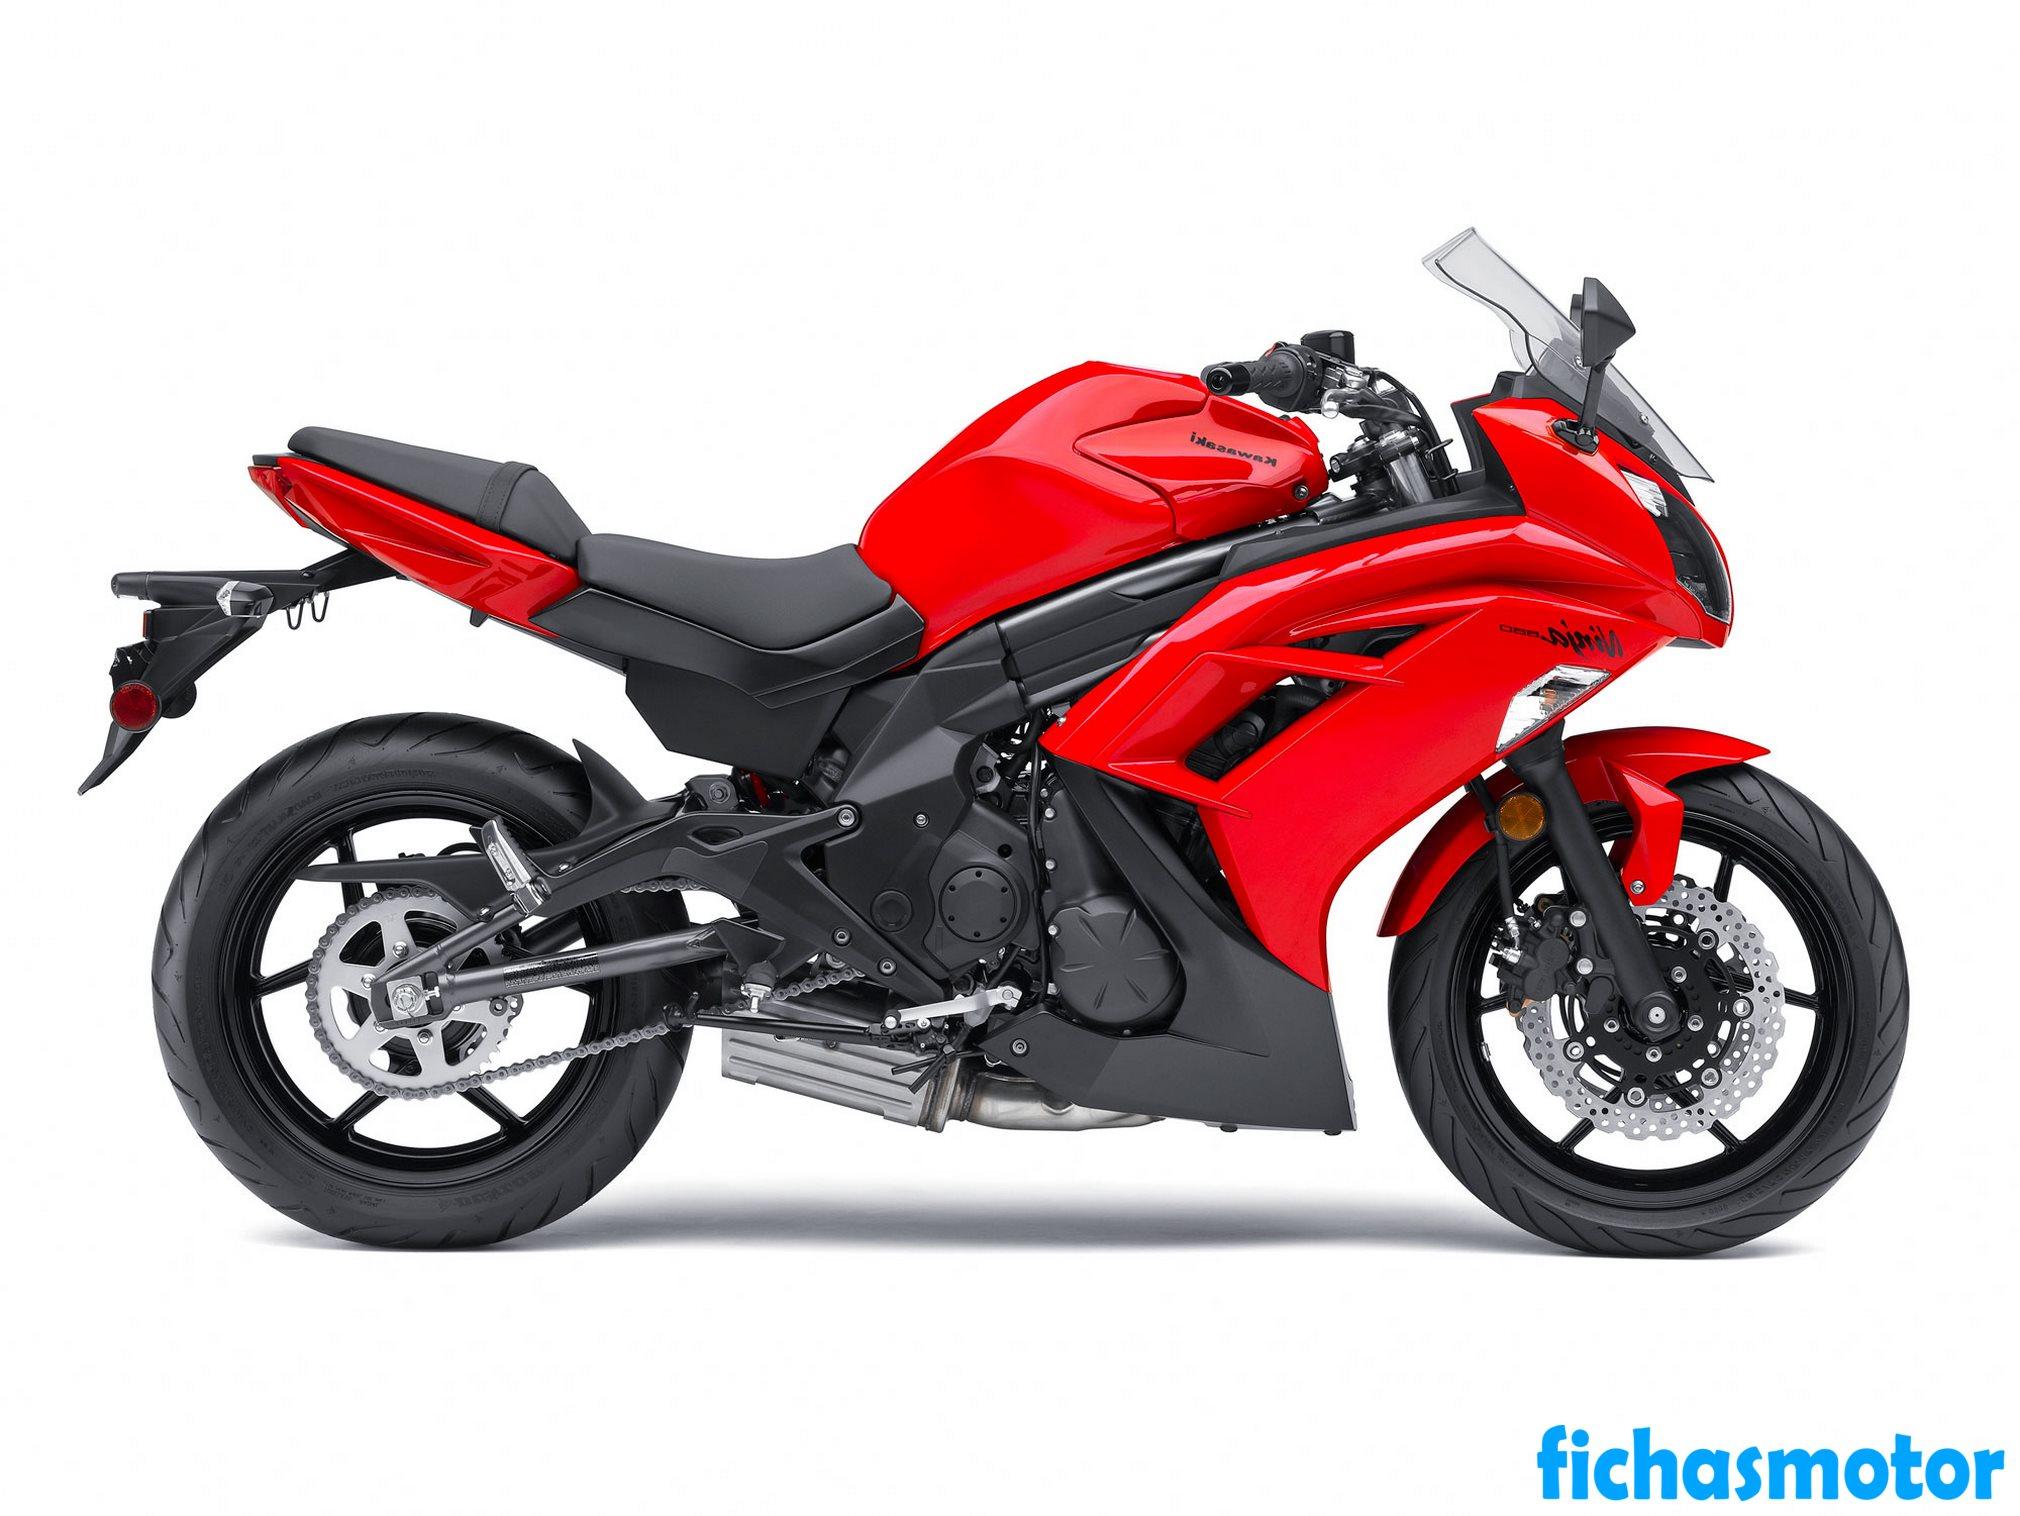 Ficha técnica Kawasaki ninja 650 2012